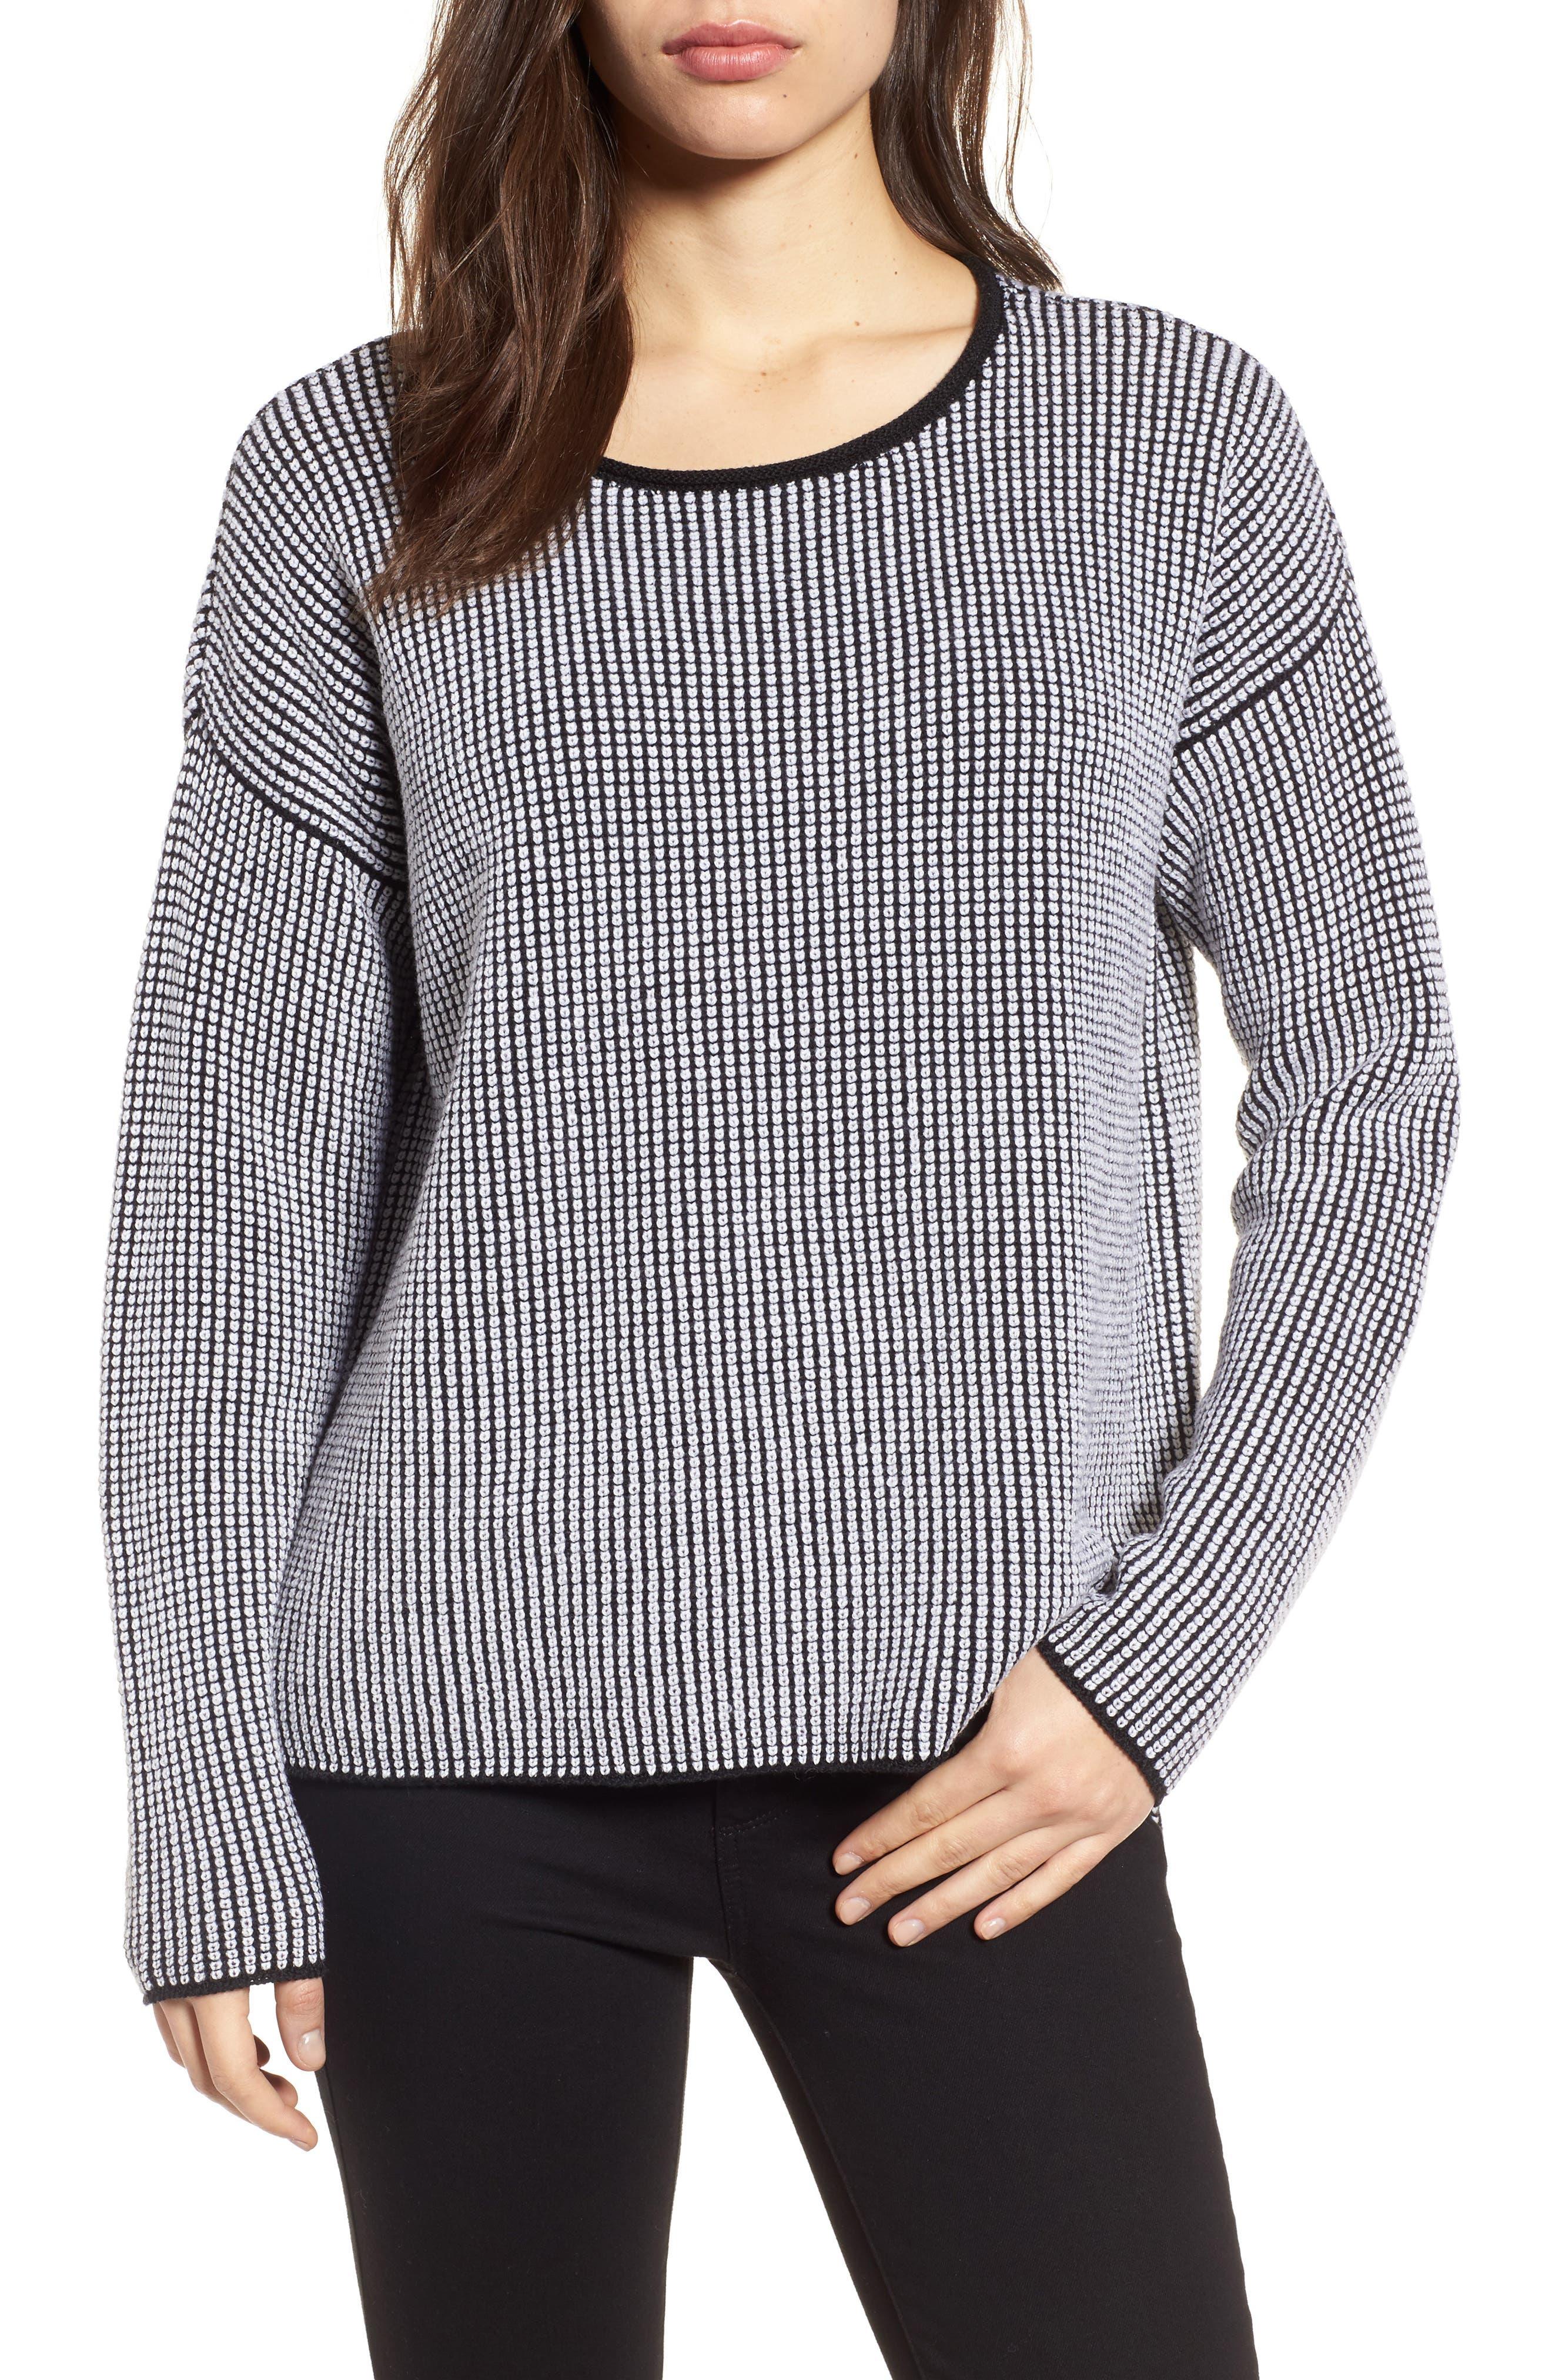 Textured Merino Wool Sweater,                             Main thumbnail 1, color,                             Black/ Soft White